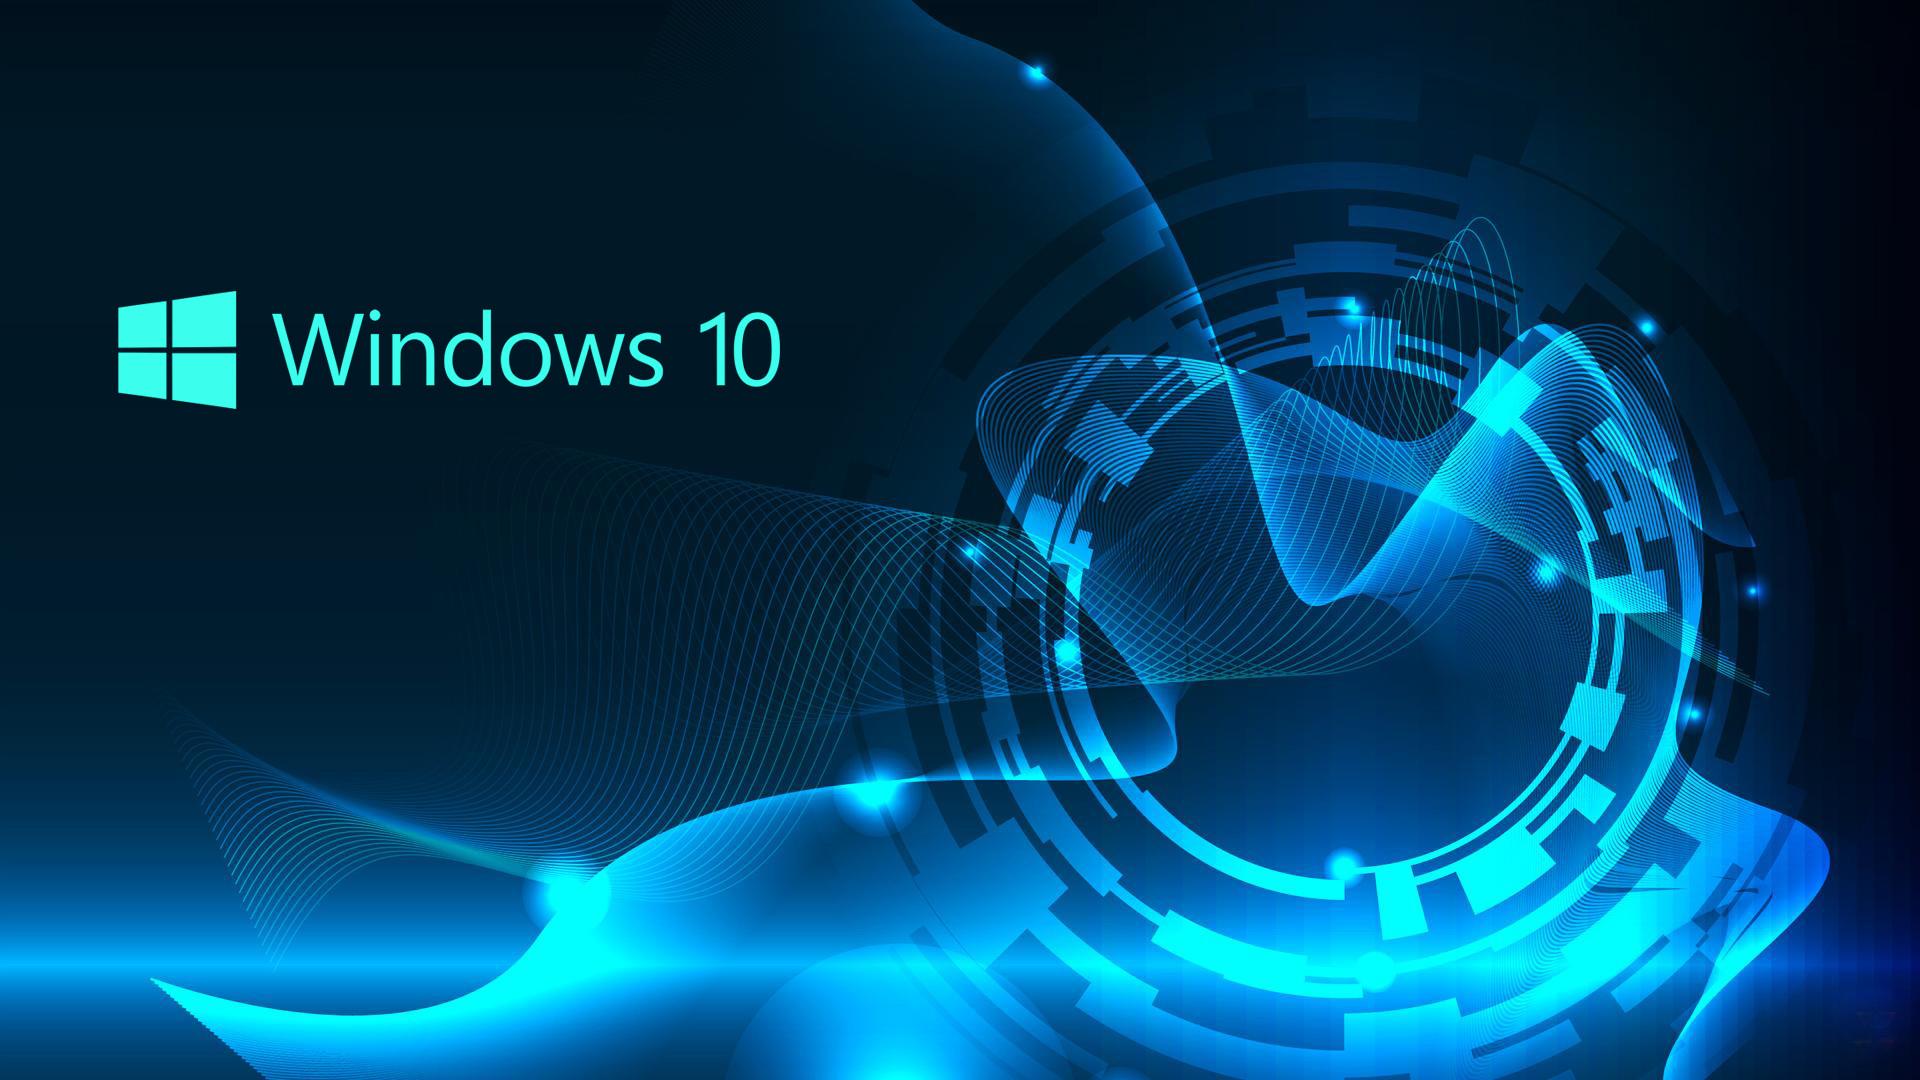 Windows 10 Wallpaper Hd 1080p Free Download - Windows 10 Wallpaper Hd - HD Wallpaper